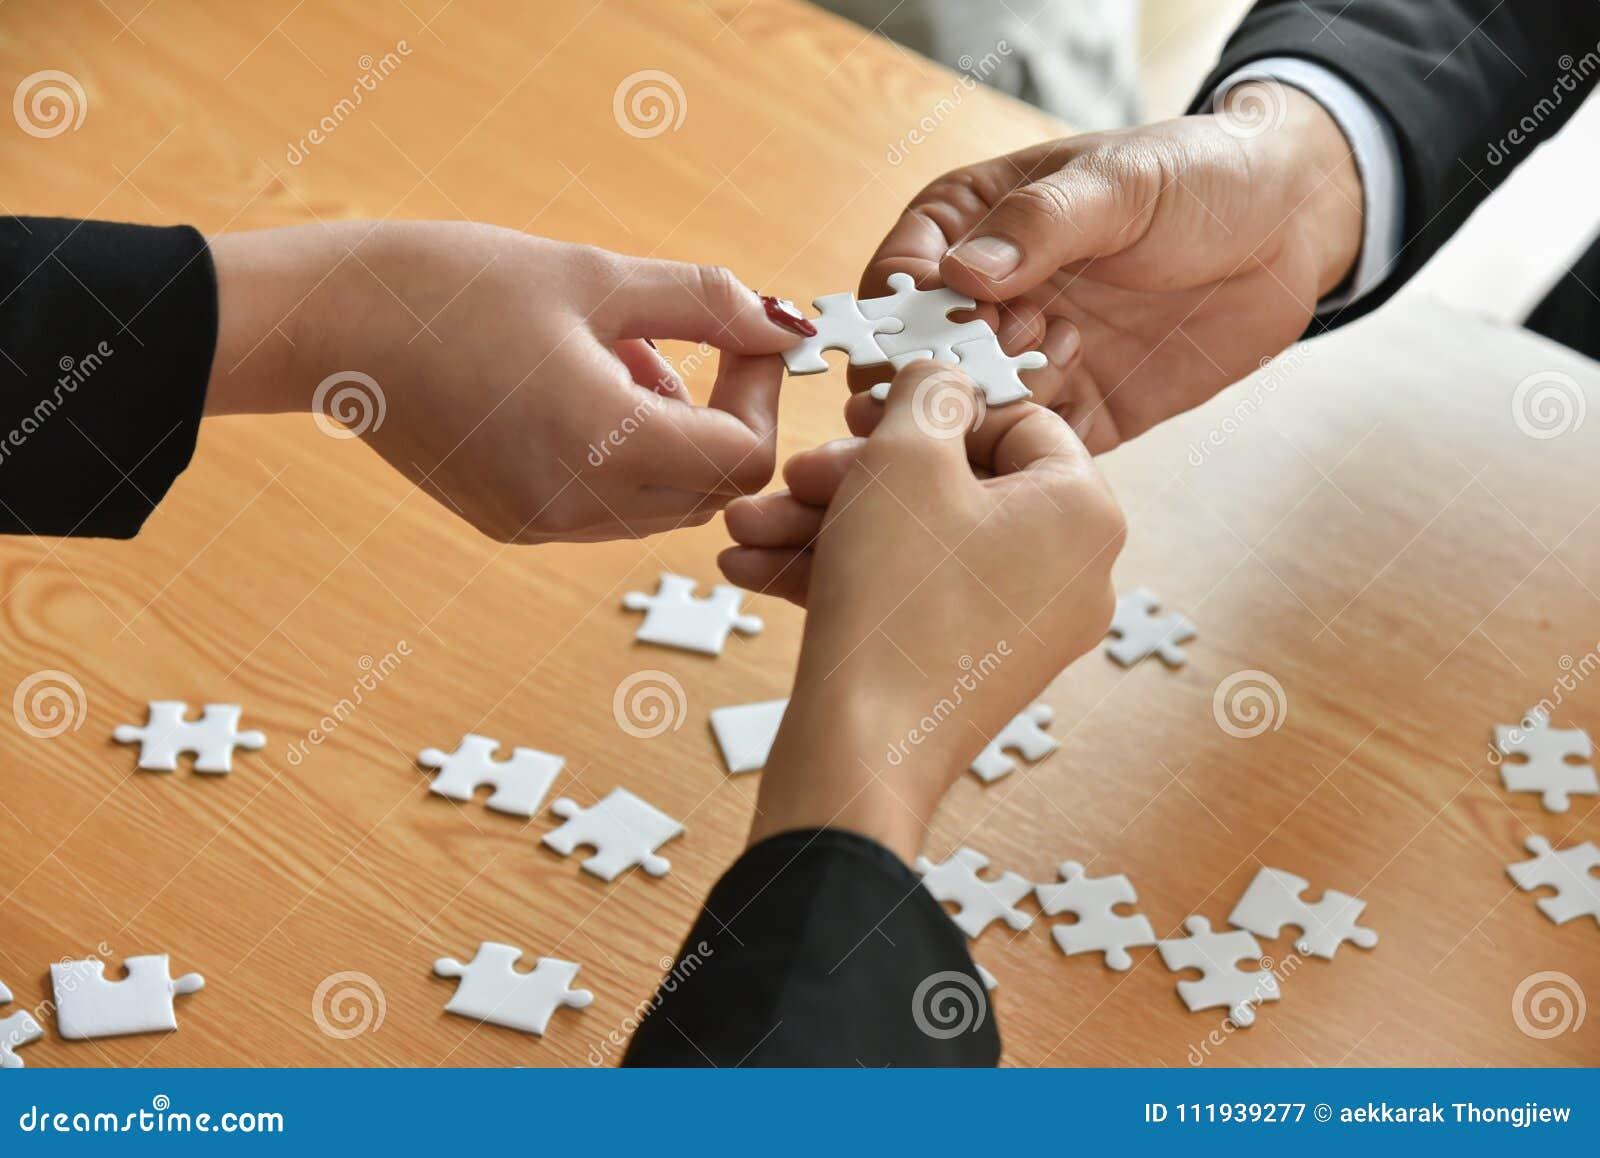 Gruppe Geschäftsleute Hände schließen Puzzlen an